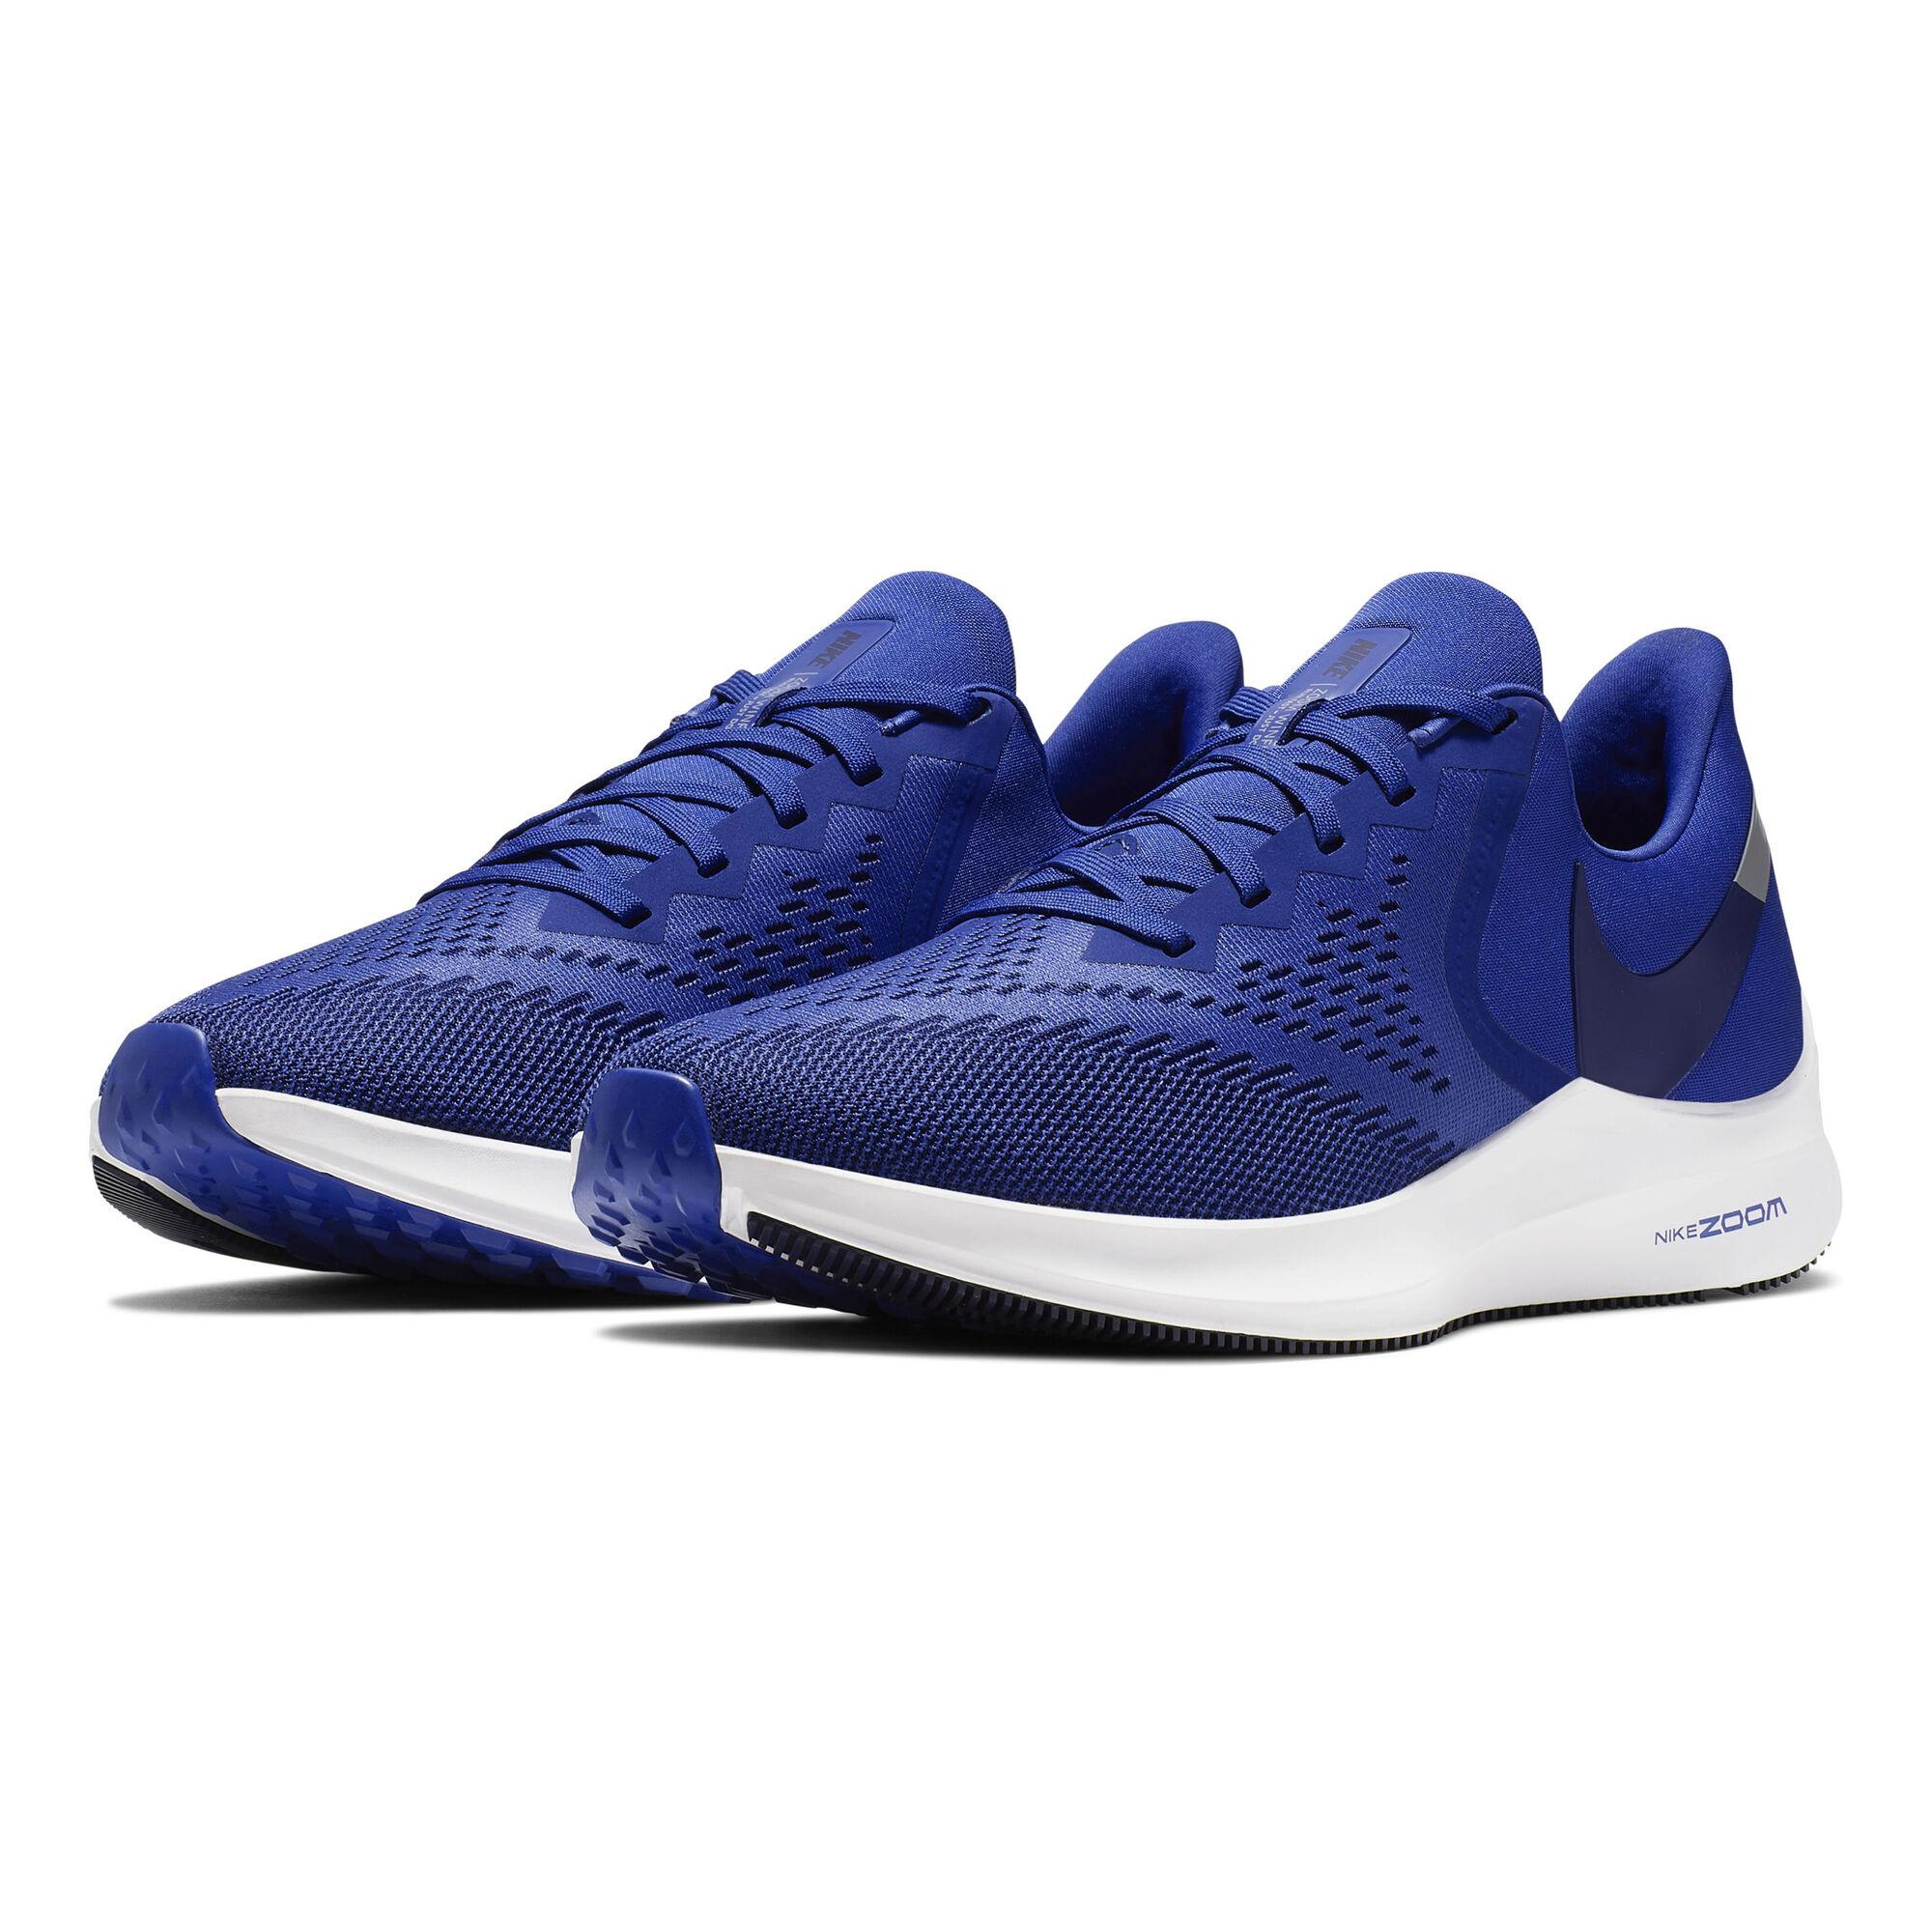 37556f524c92 buy Nike Air Zoom Winflo 6 Neutral Running Shoe Men - Dark Blue ...